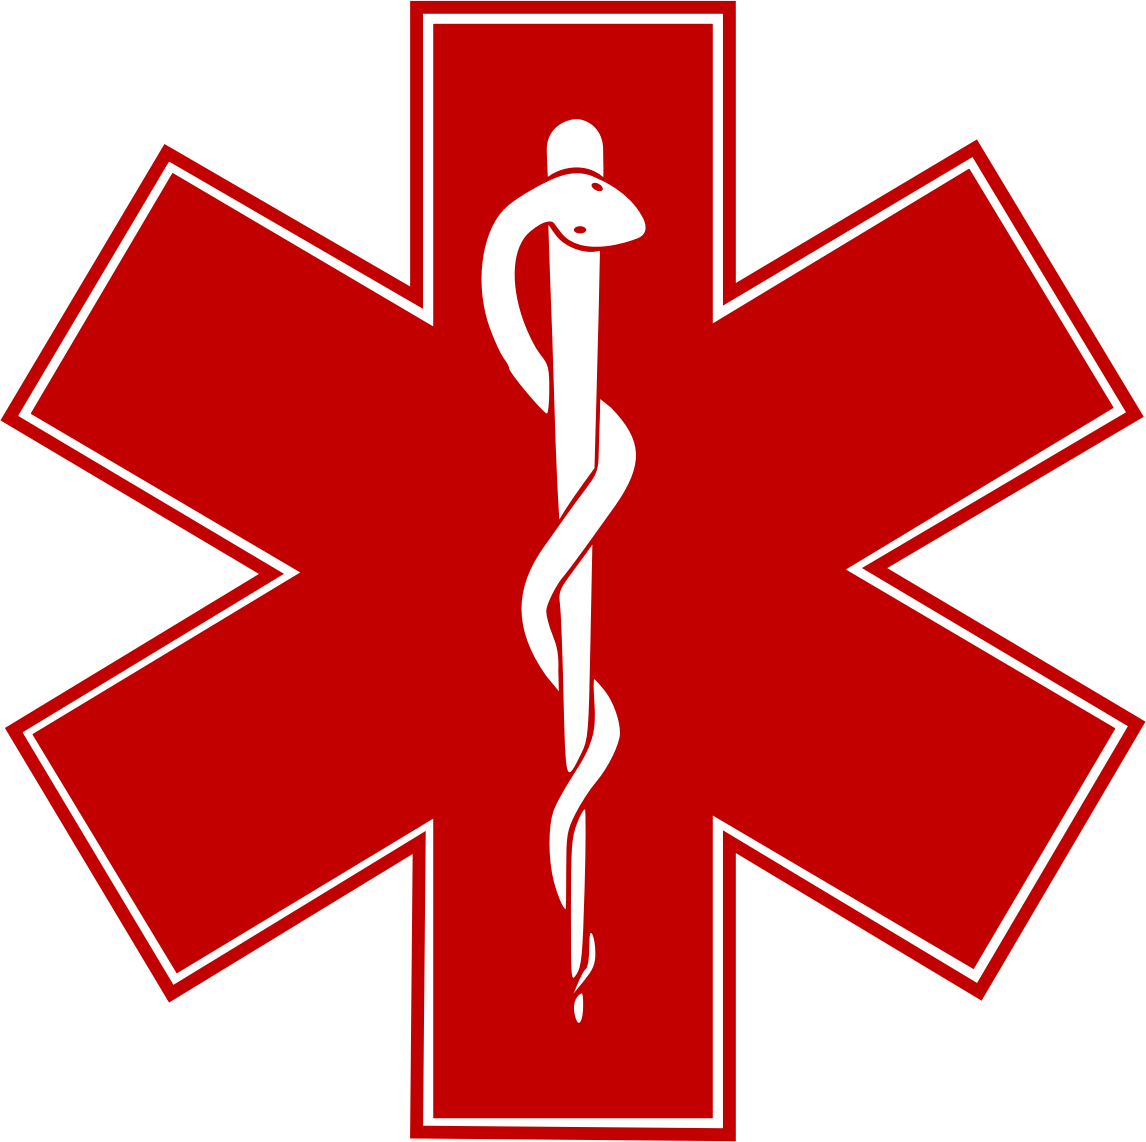 Cross ambulance free on. Xray clipart medical